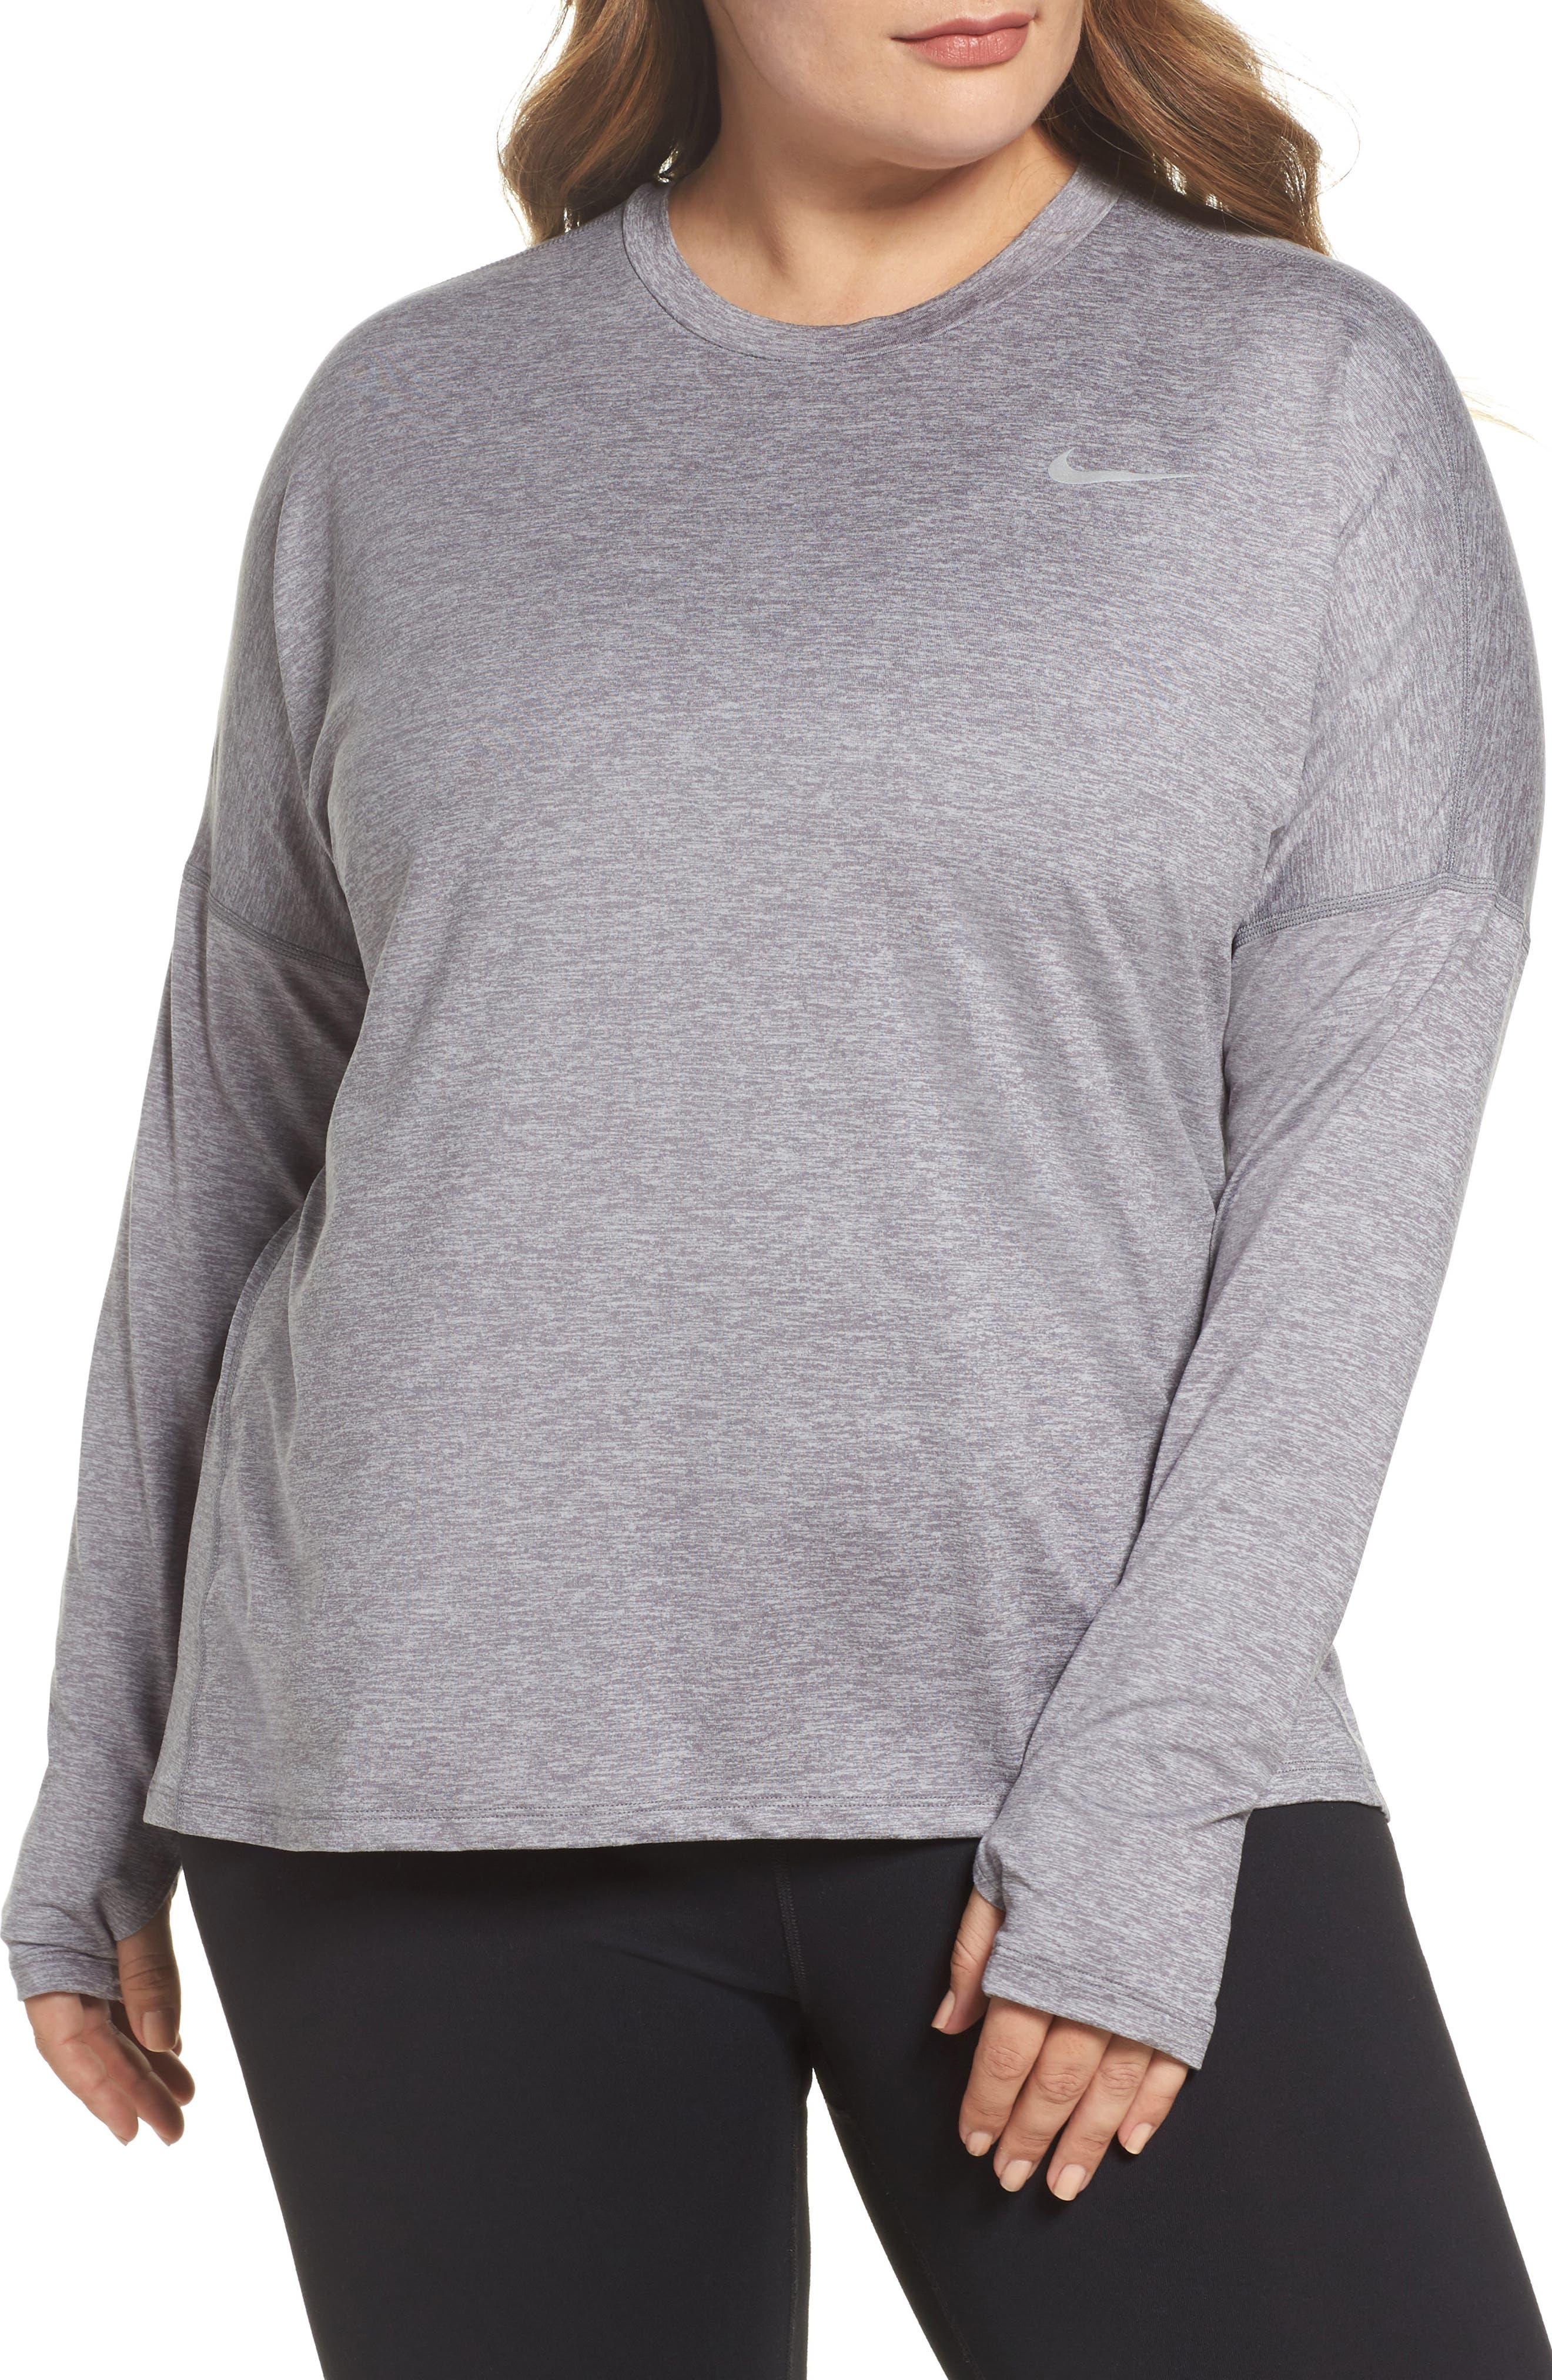 Dry Element Long Sleeve Top,                         Main,                         color, Gunsmoke/ Atmosphere Grey